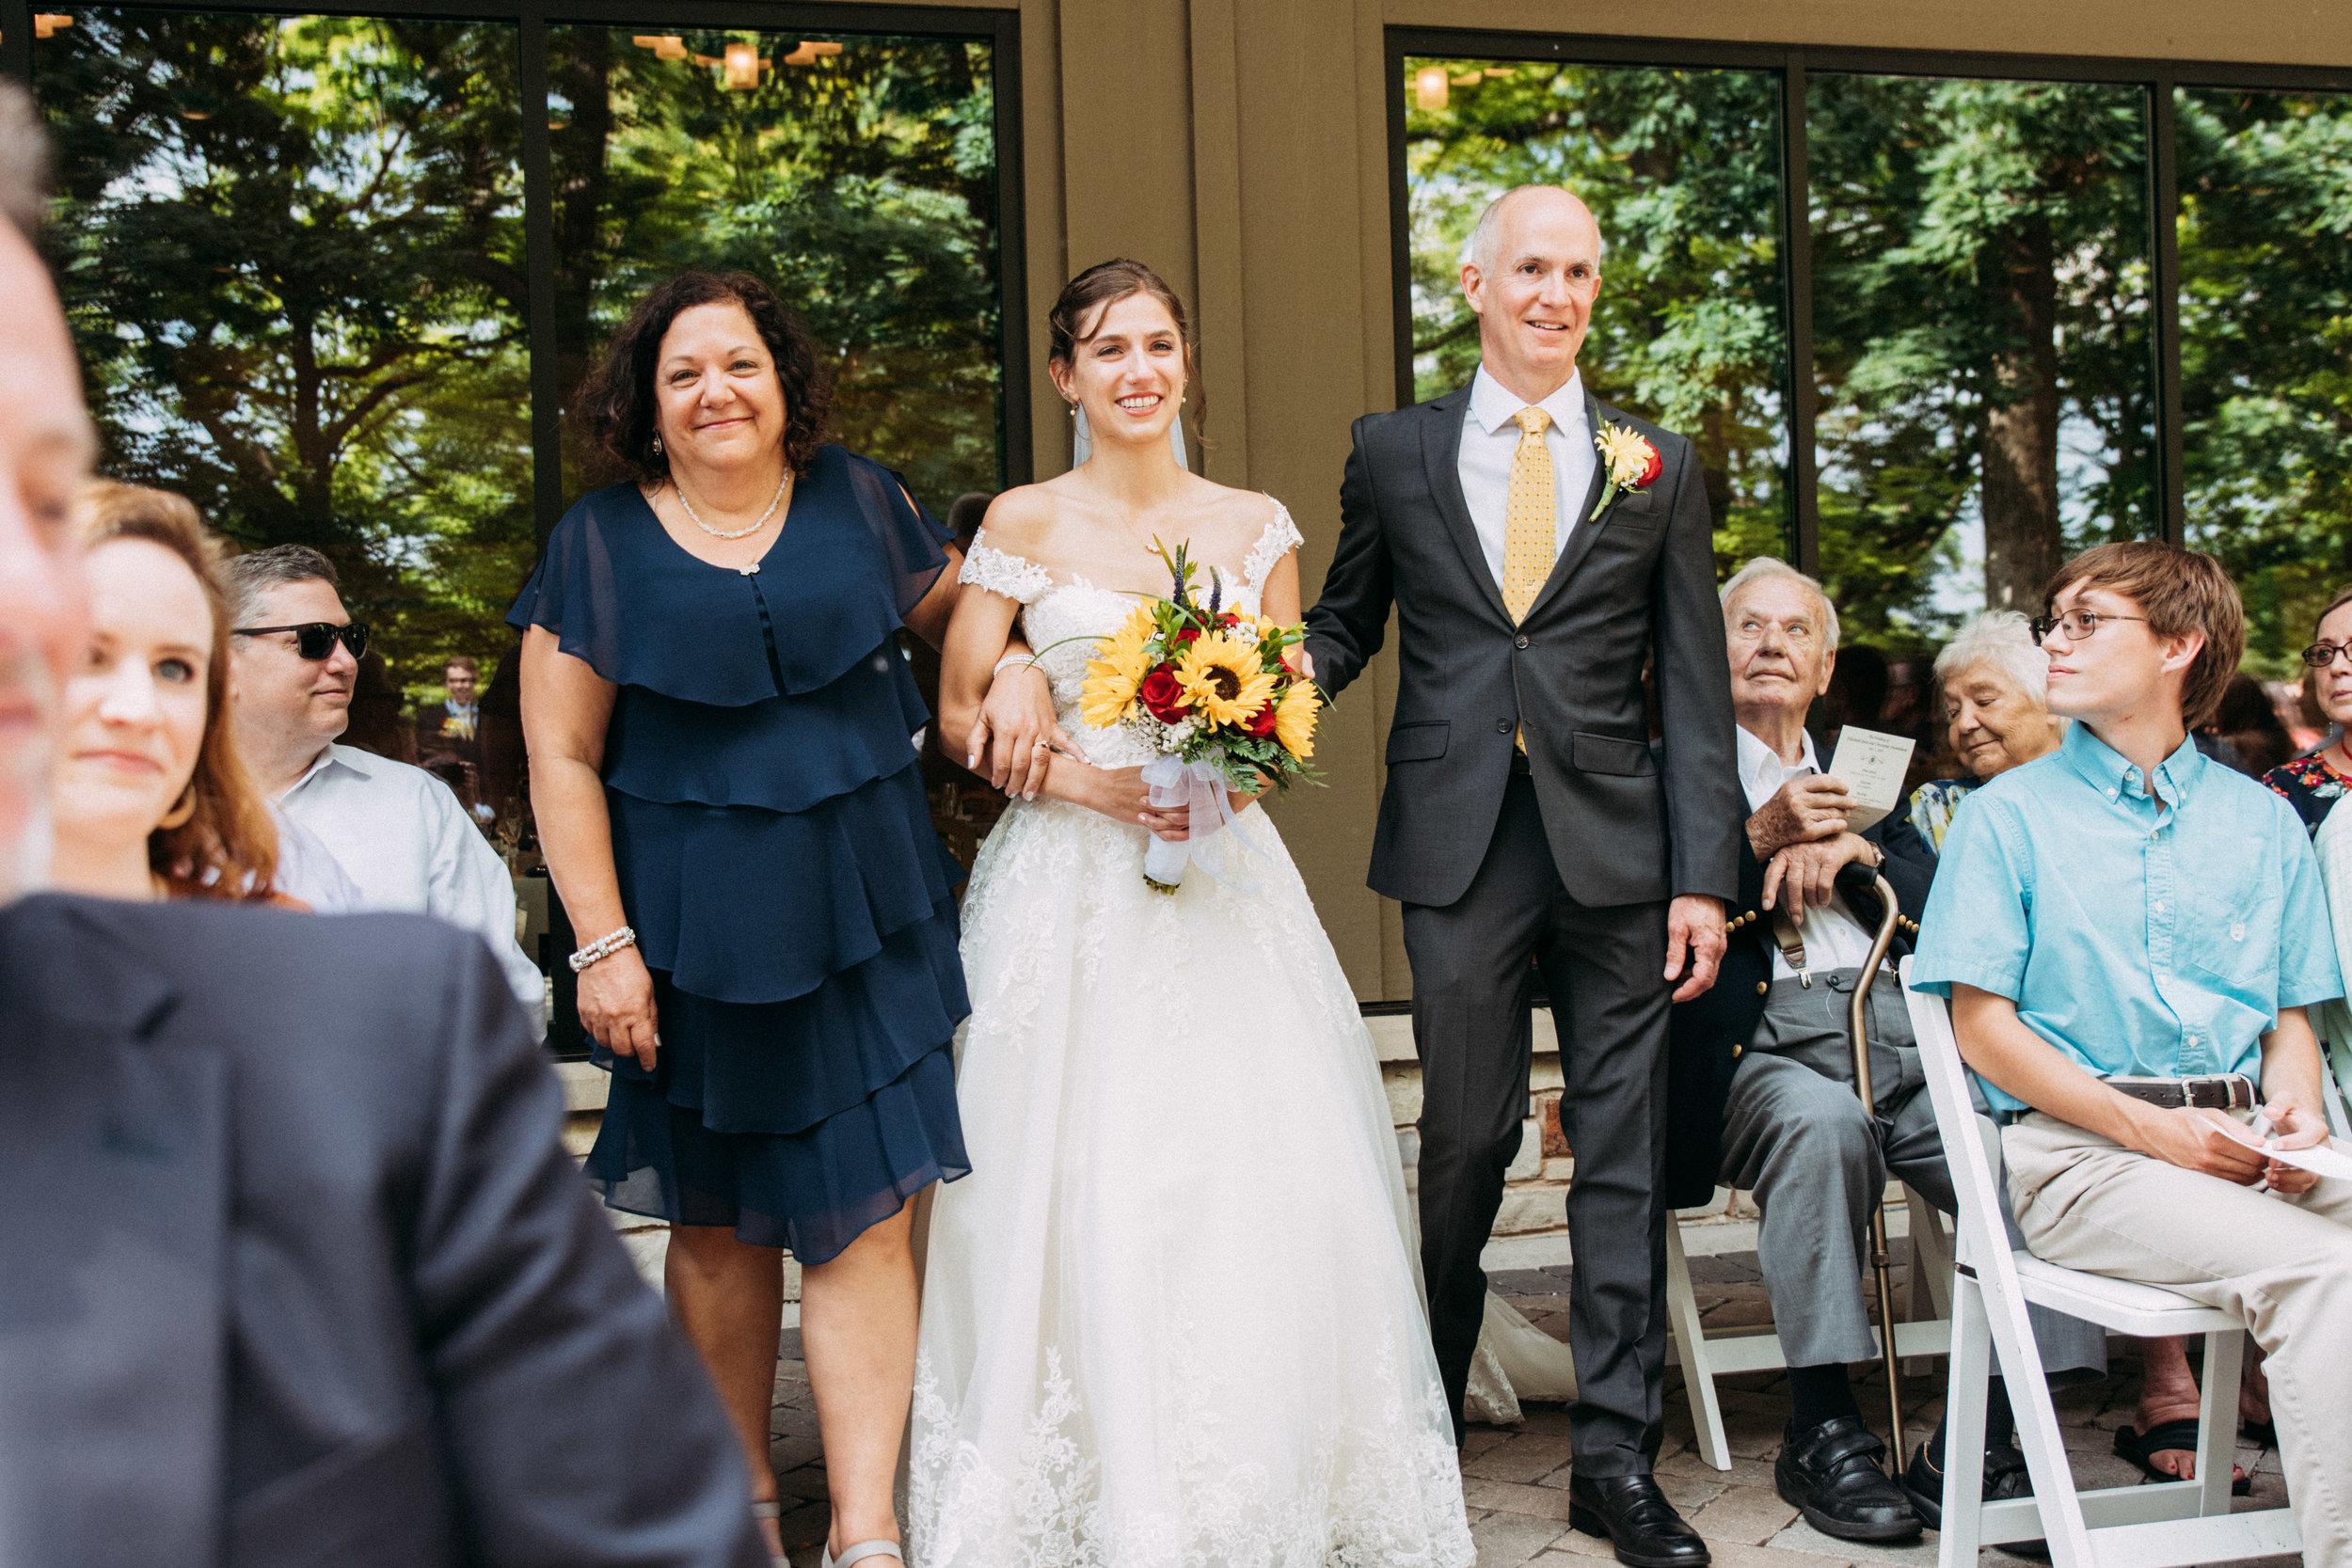 23-Liza_Chris_Minneapolis_Minnesota_Wedding.jpg